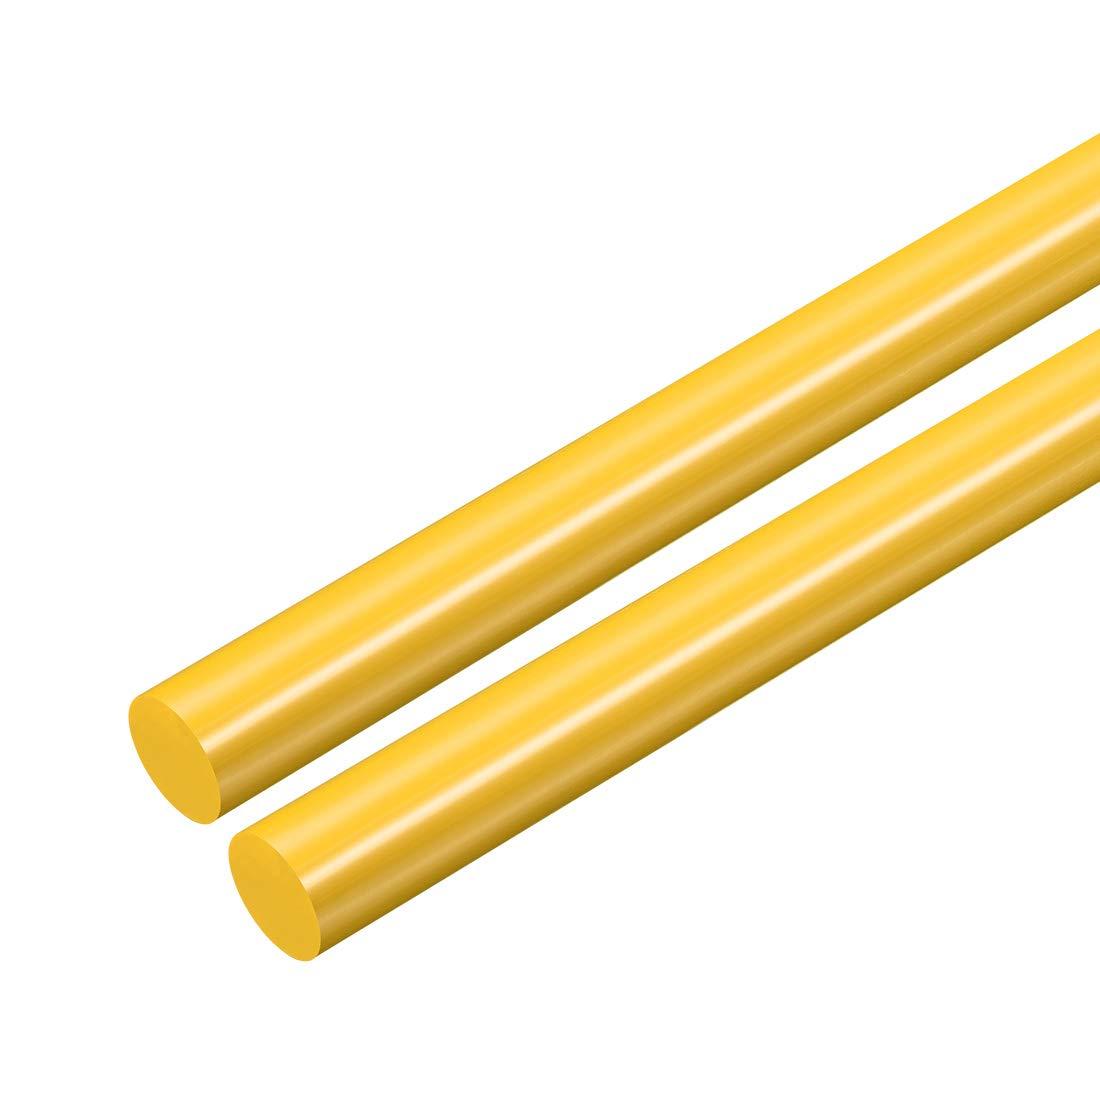 12mm Polyoxymethylene Rods Engineering Plastic Round Bars POM sourcing map 2pcs Plastic Round Rod 1//2 inch Dia 20 inch Length Yellow